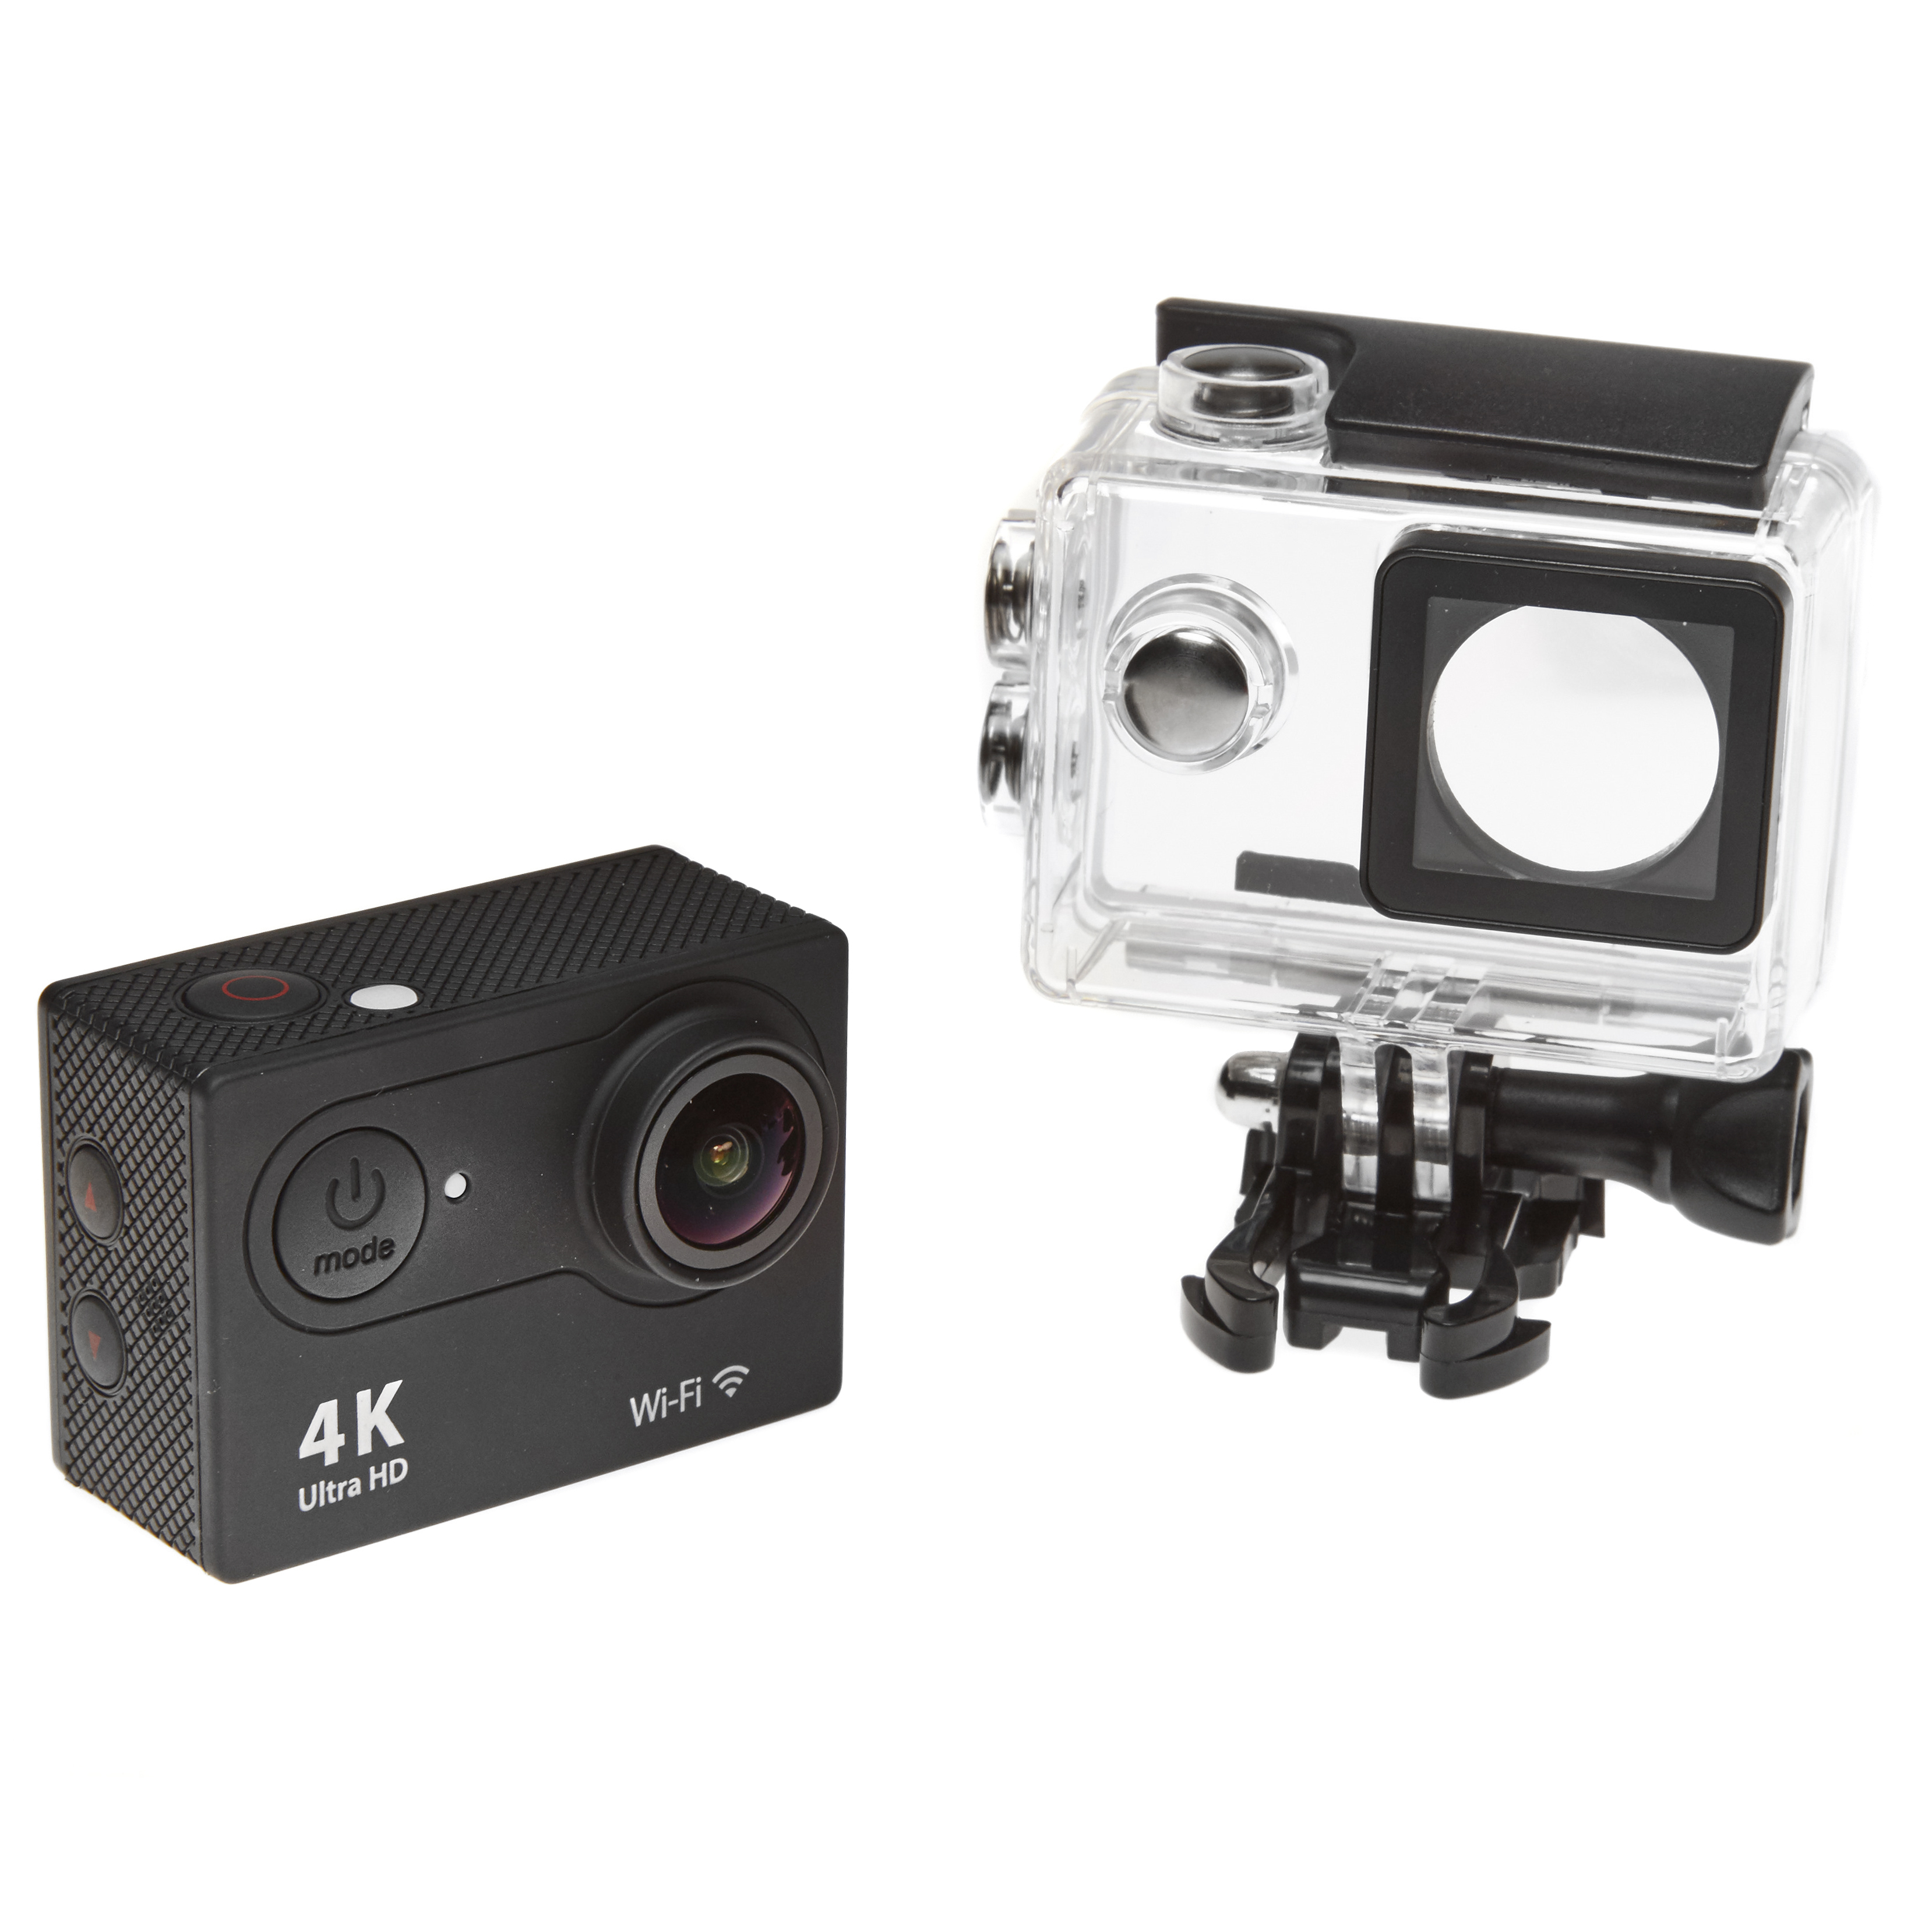 4k ultra hd outdoor action dash cam camera black super